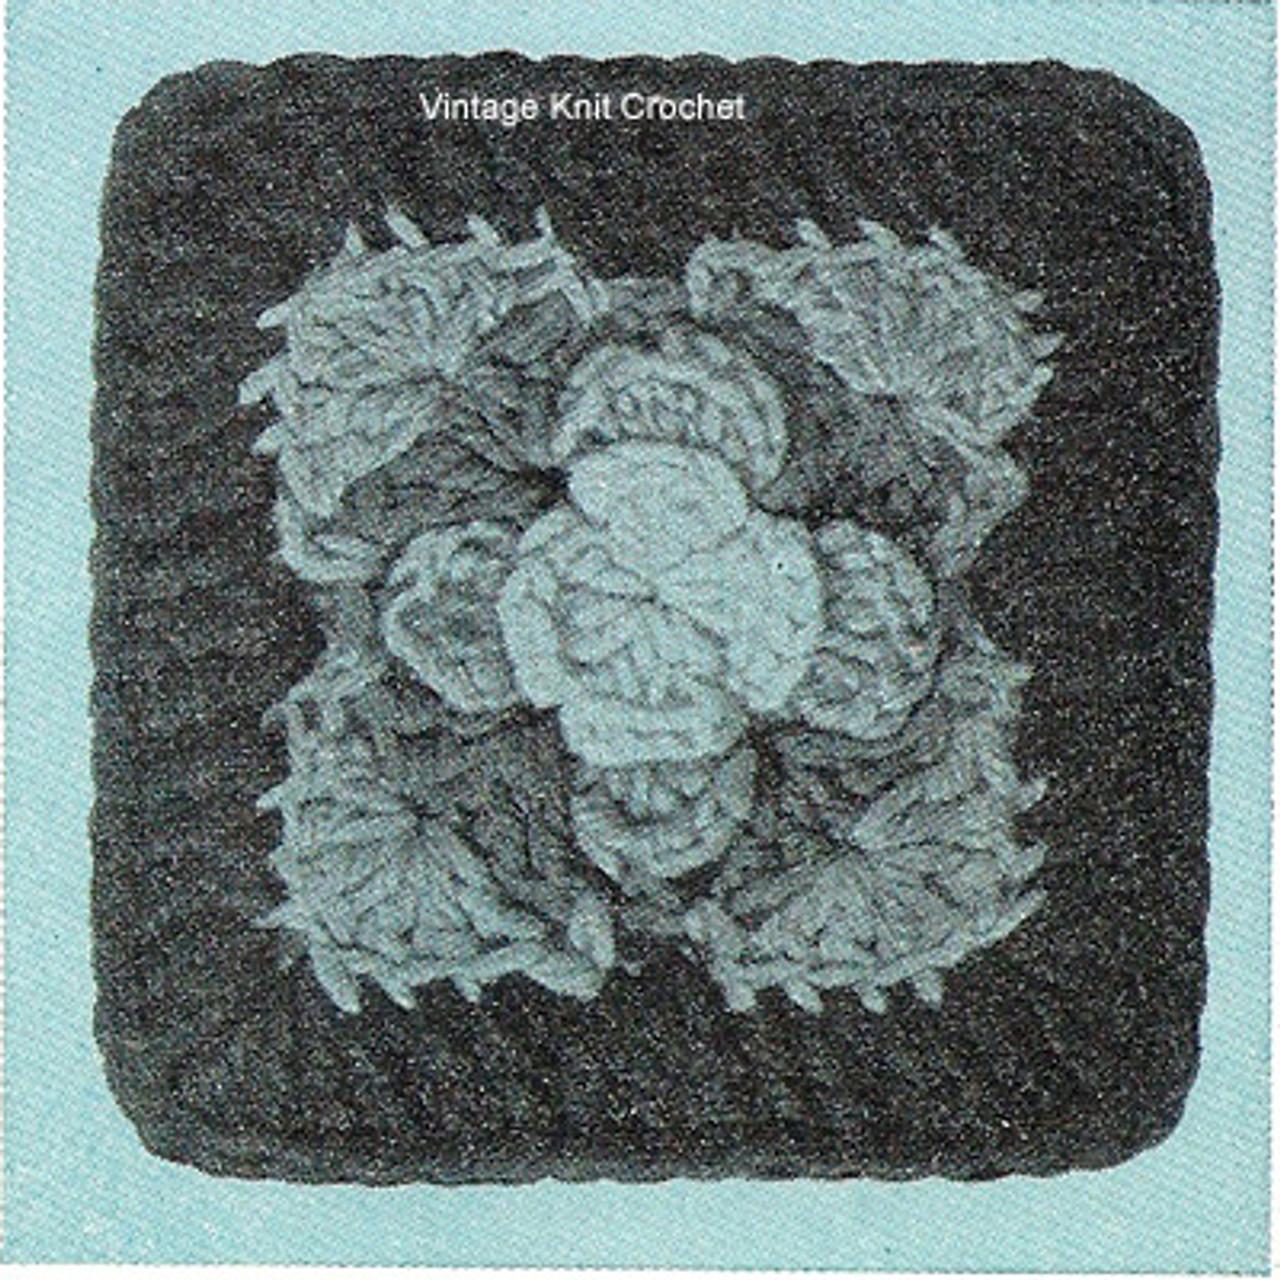 Rose Square Crochet Pattern illustration